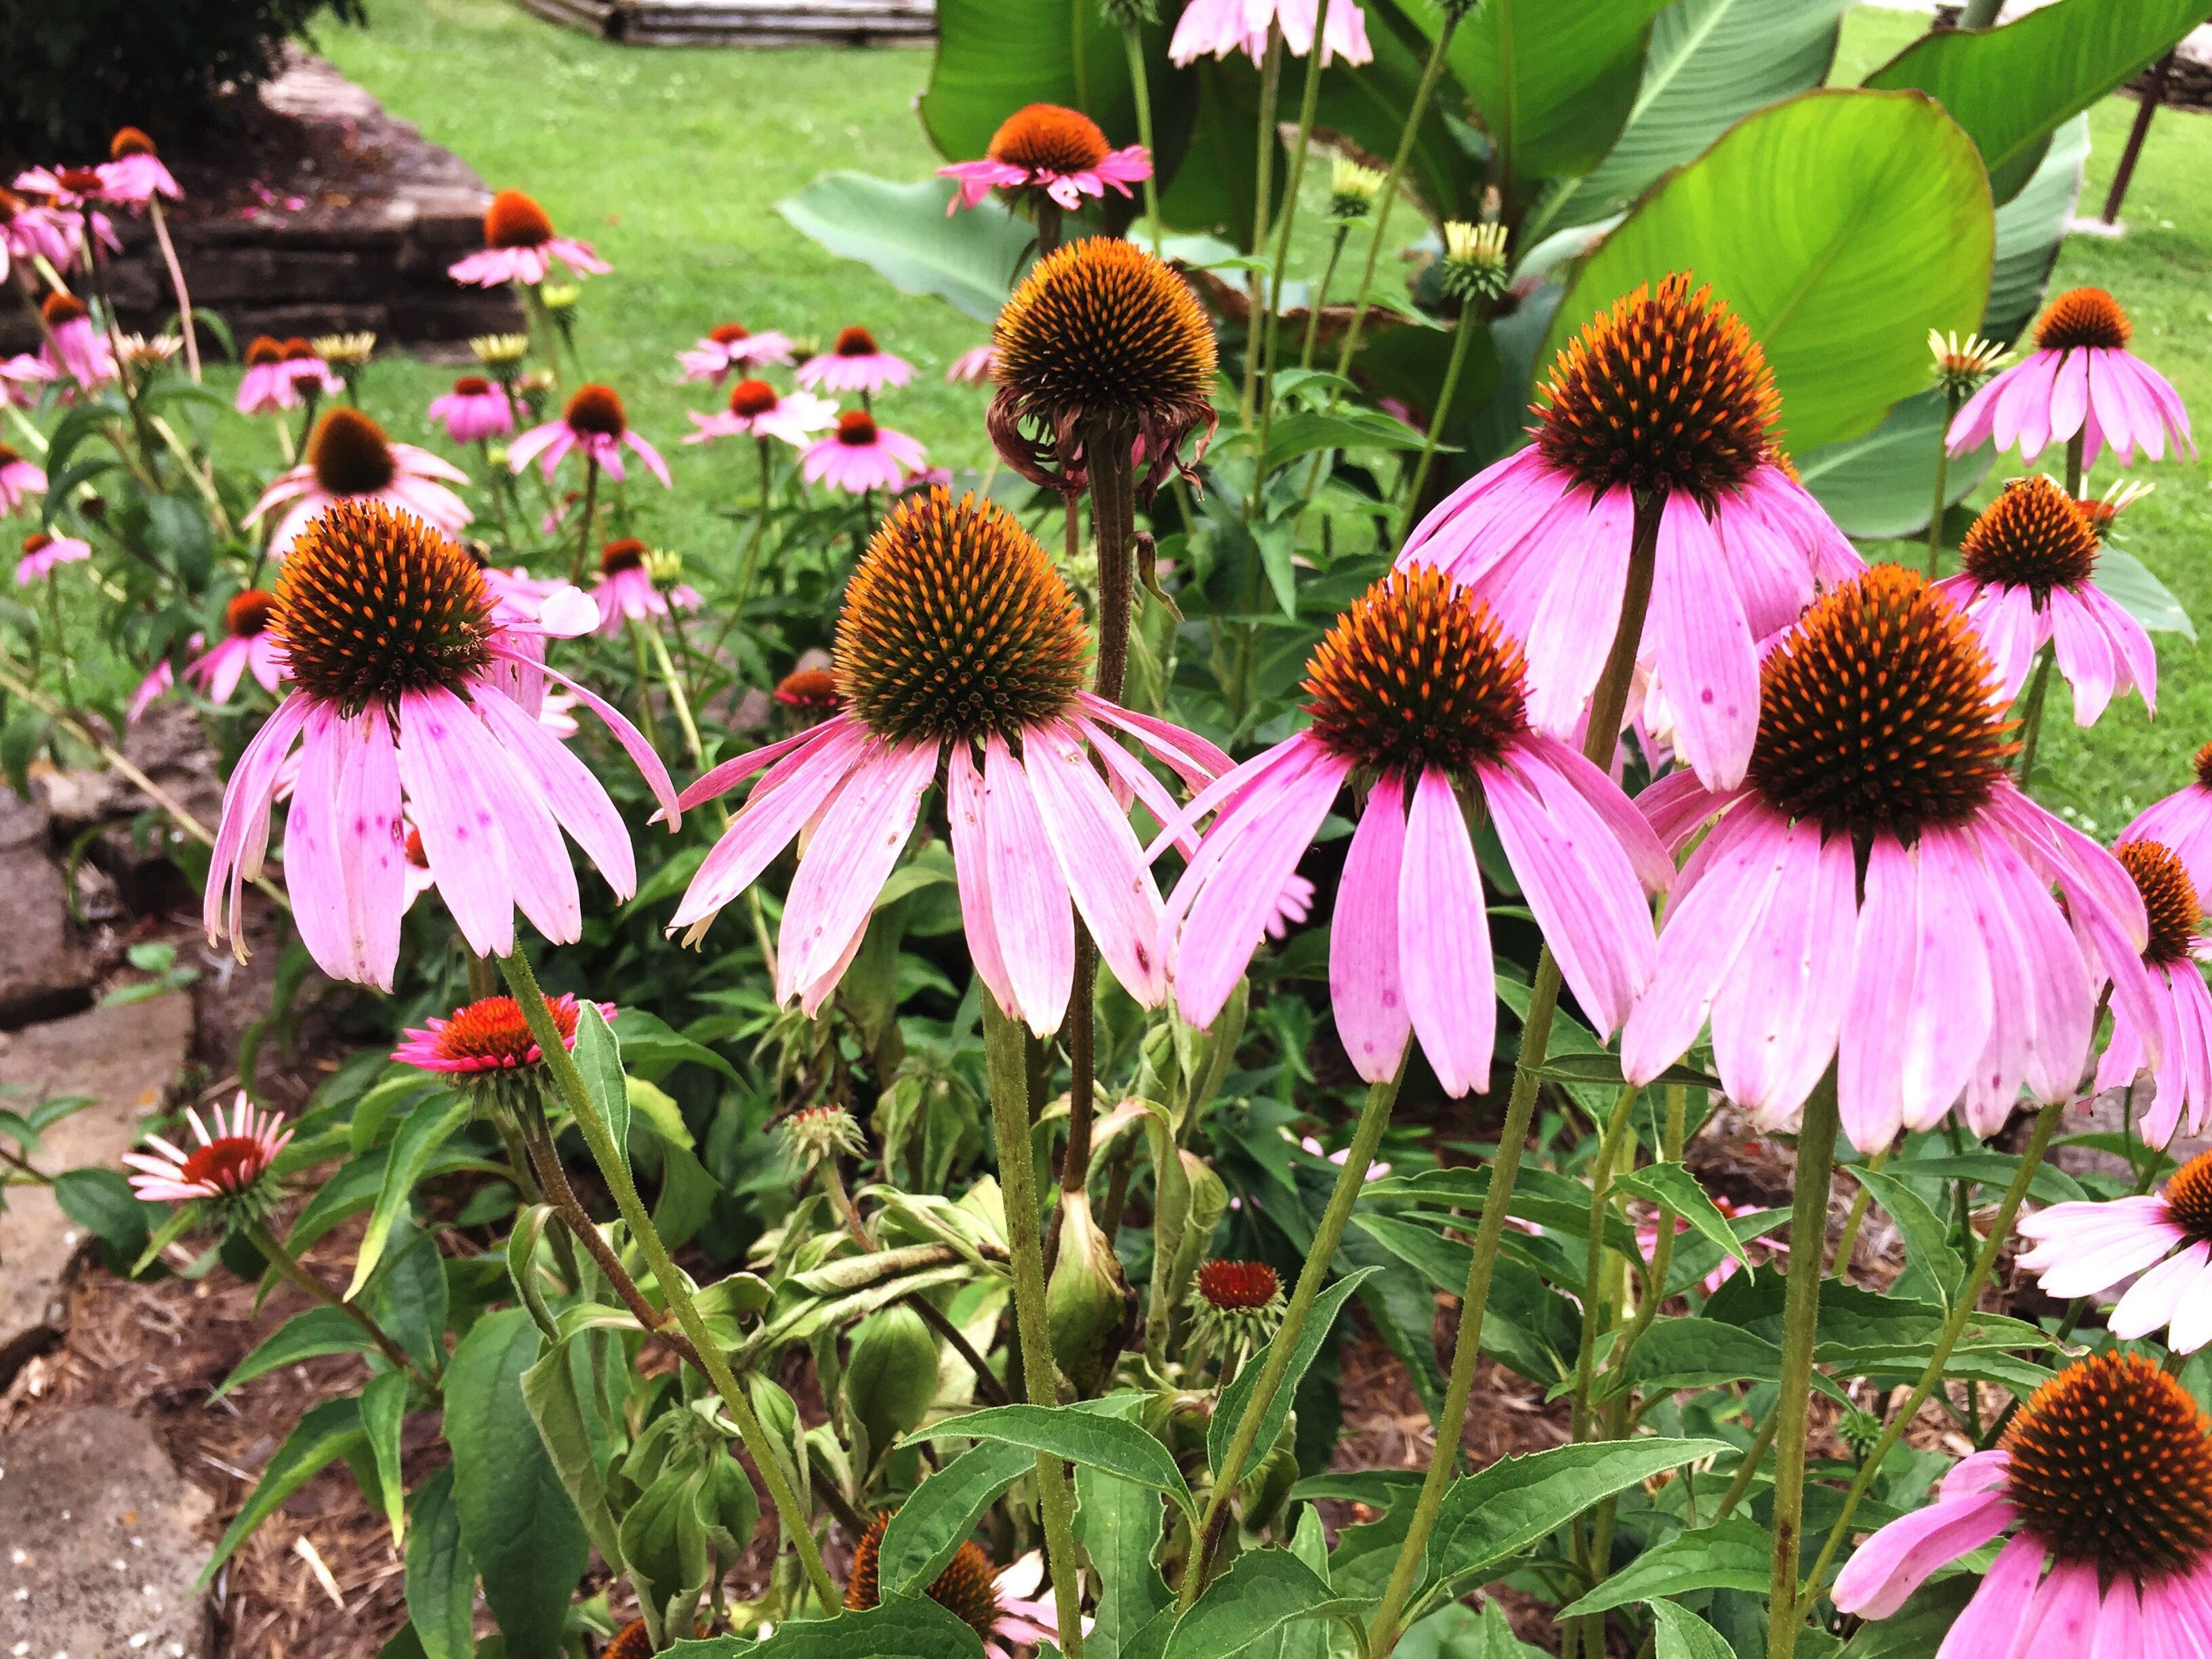 Coneflowers Garden Favorites For A Reason Native Plants Plants Butterfly Plants